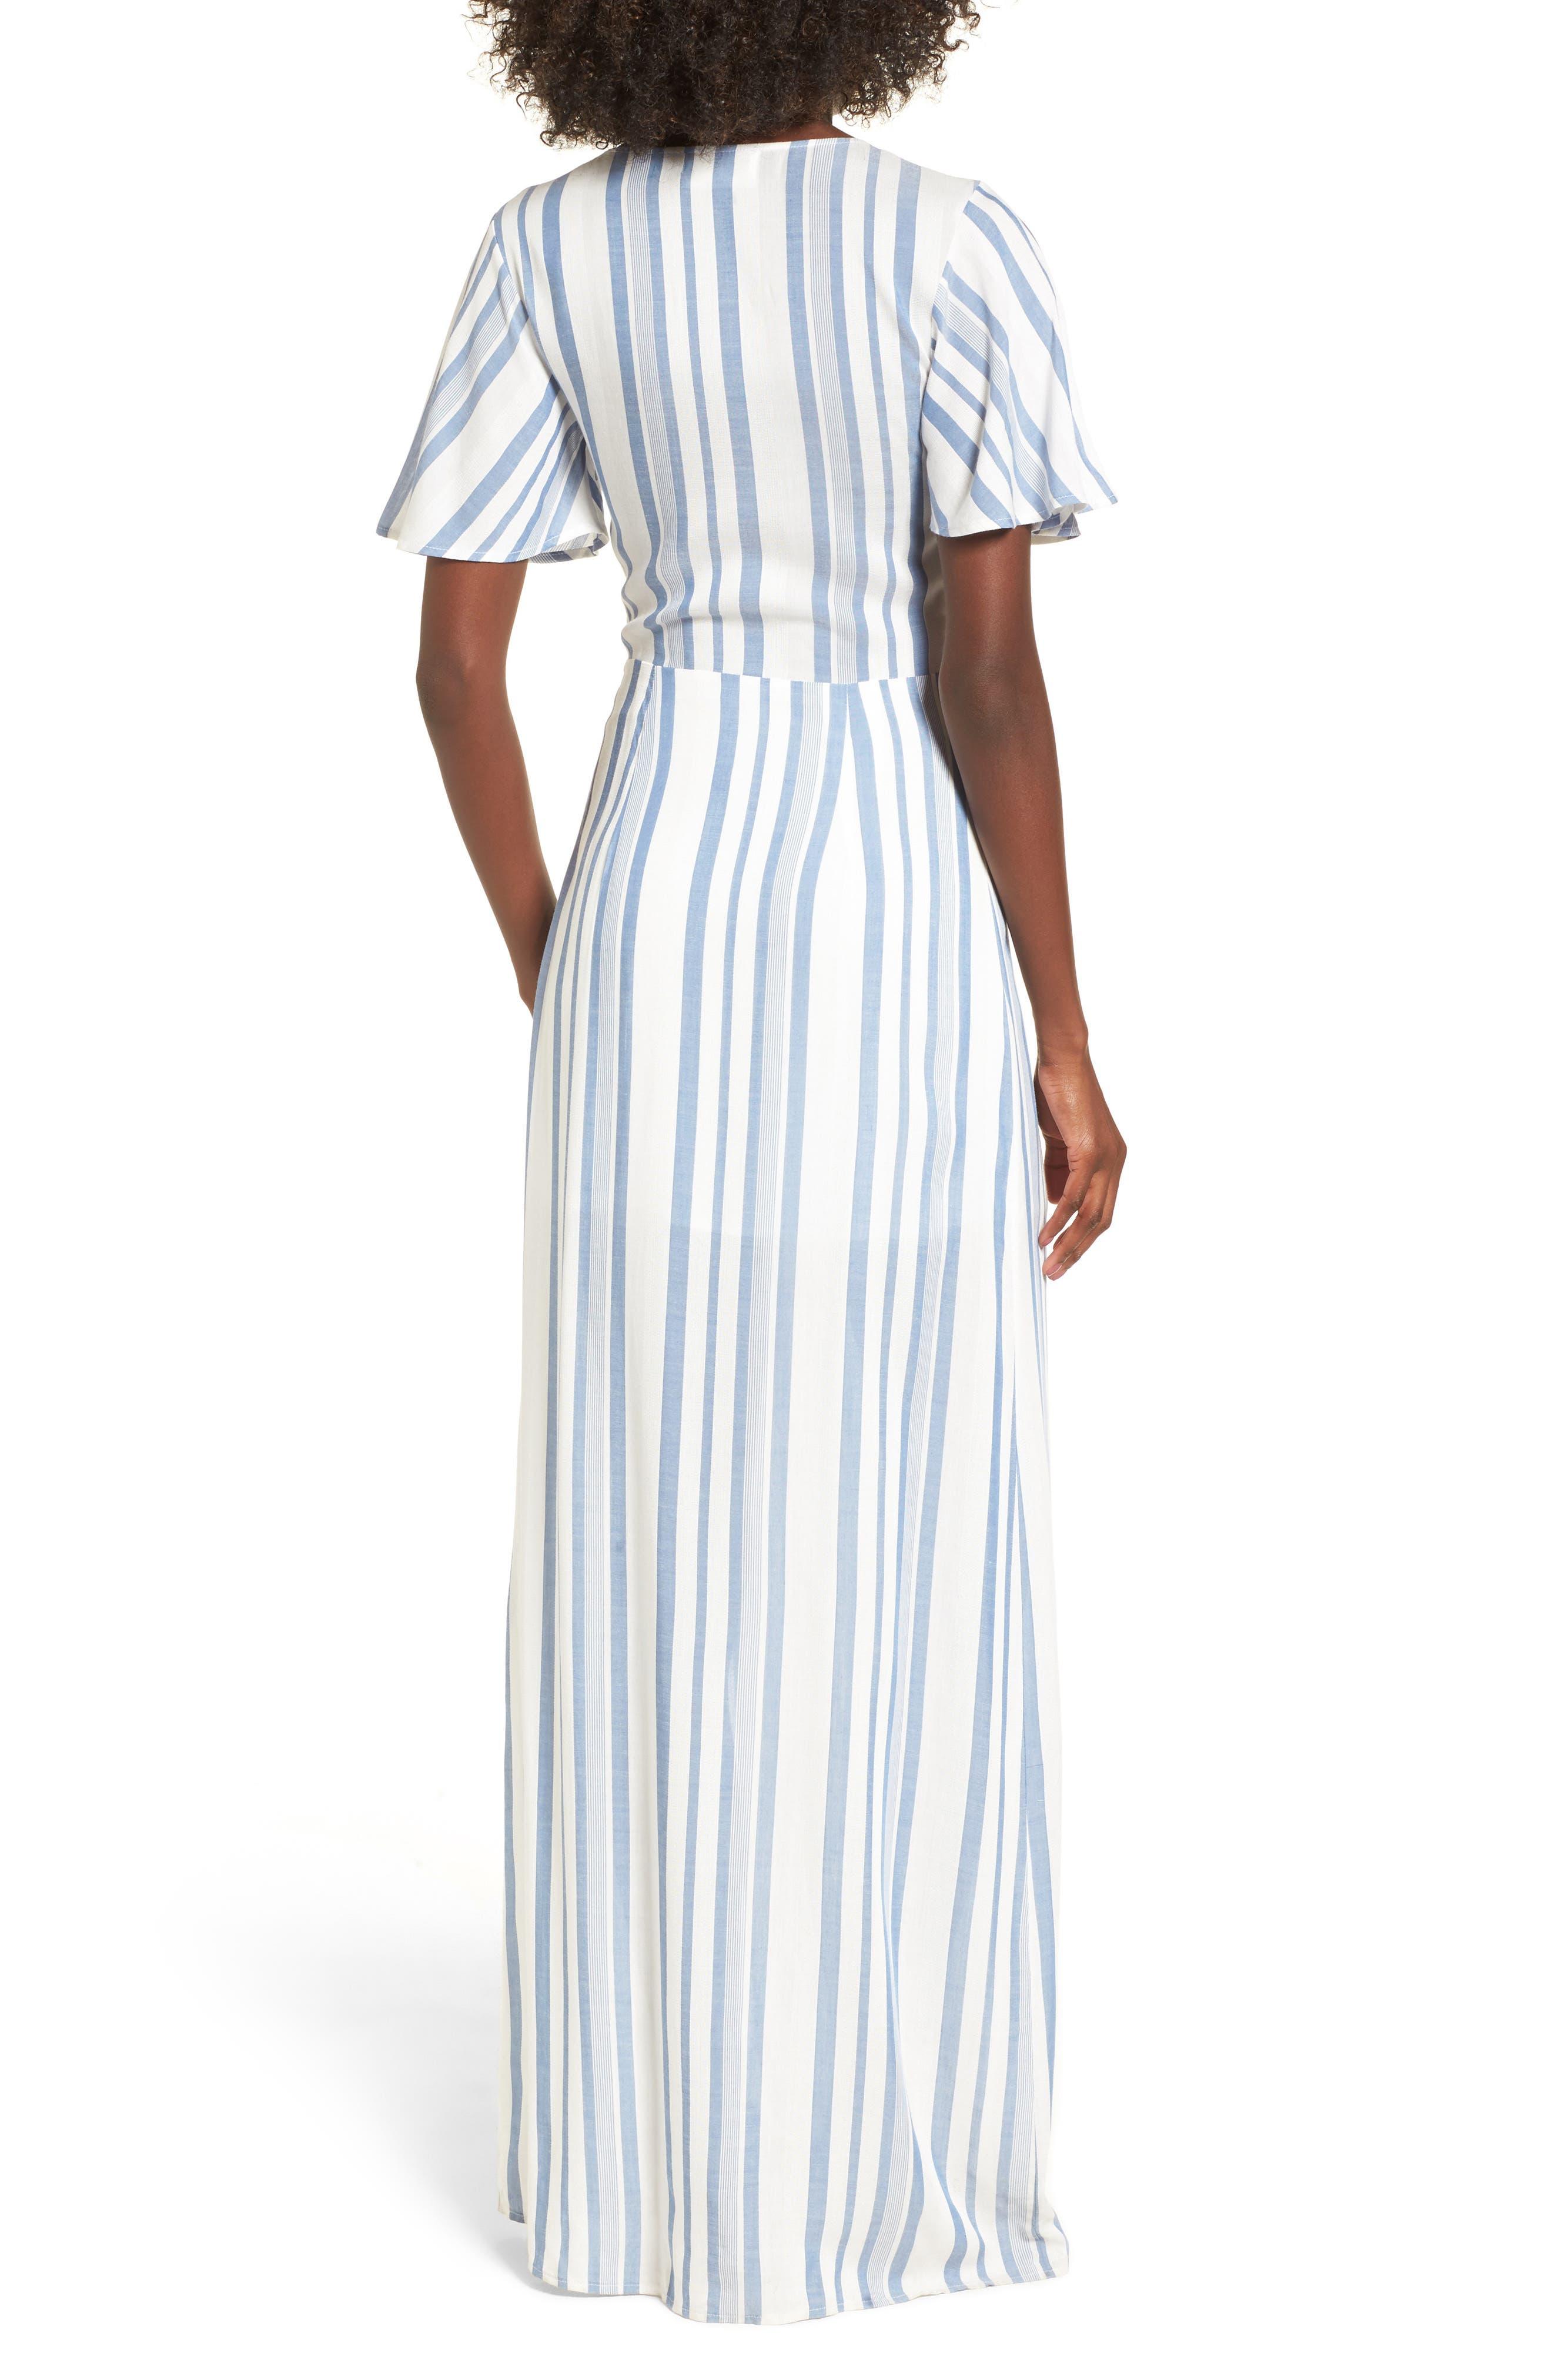 Bow Front Marina Maxi Dress,                             Alternate thumbnail 2, color,                             White/ Blue